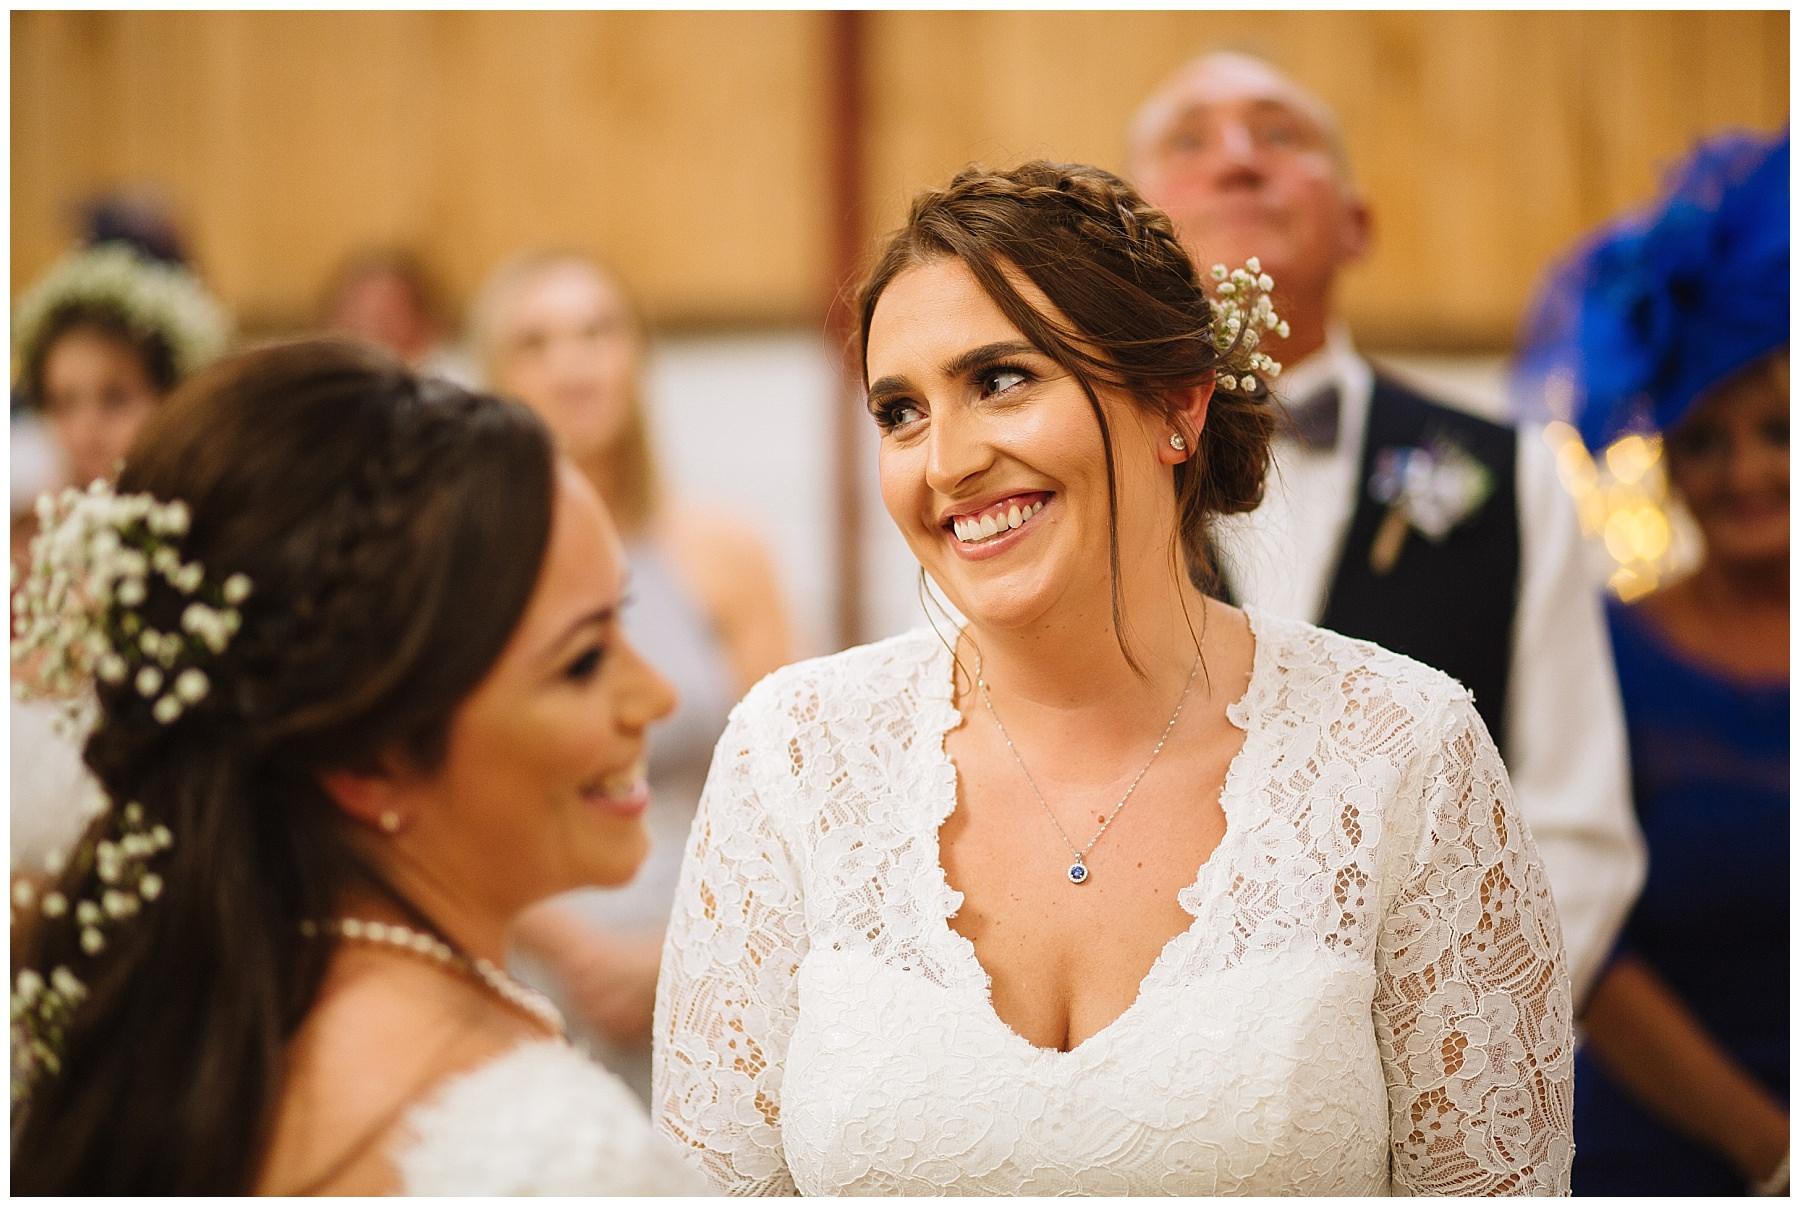 bride smiles during wedding service